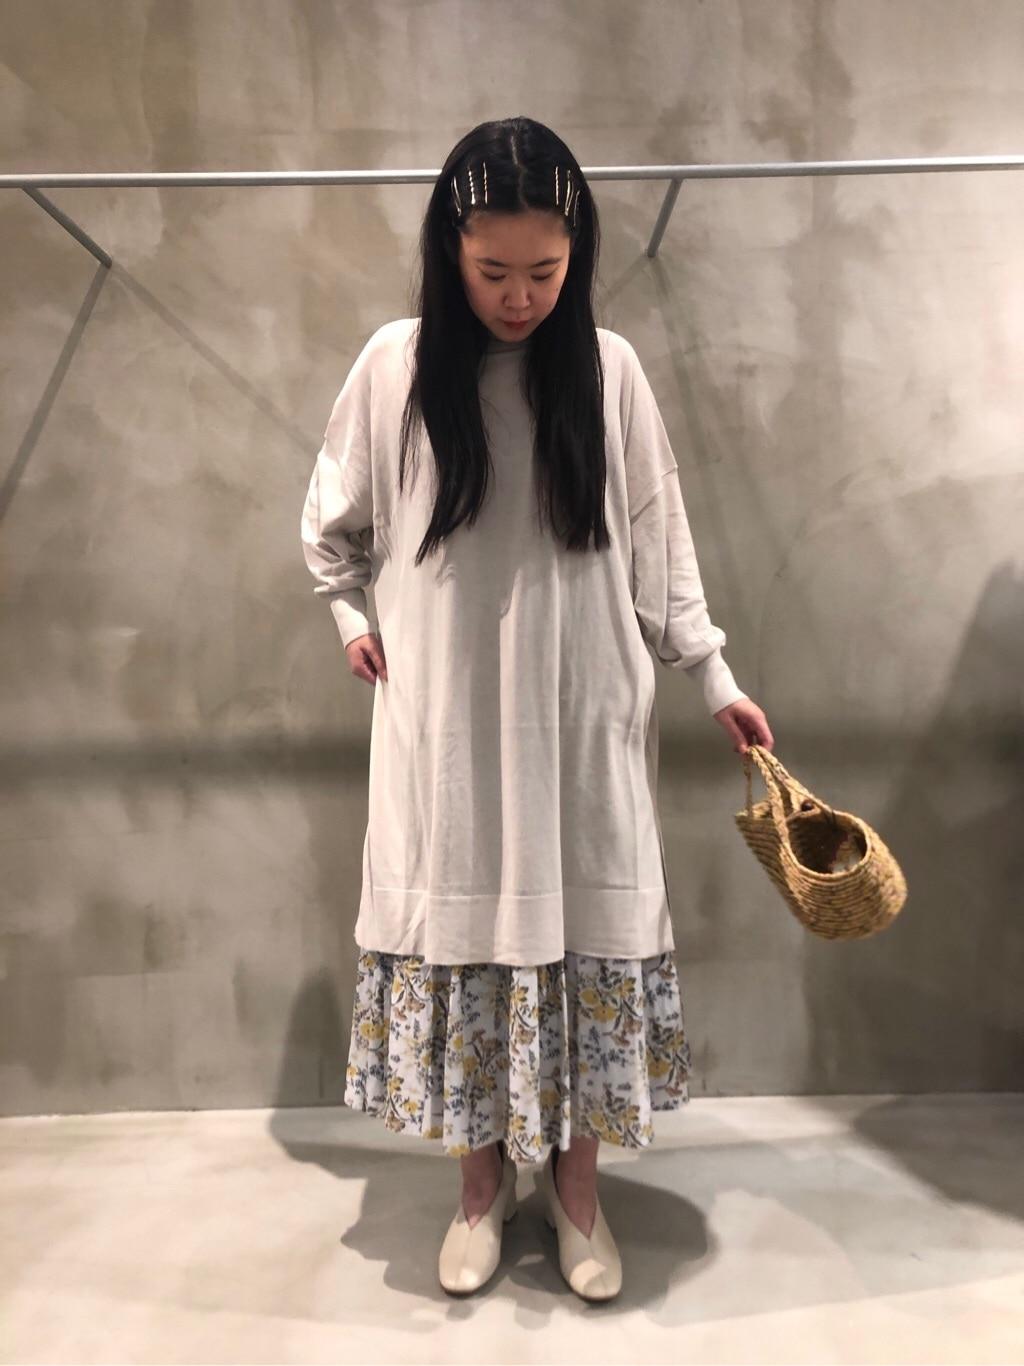 bulle de savon 渋谷スクランブルスクエア 身長:157cm 2020.06.14